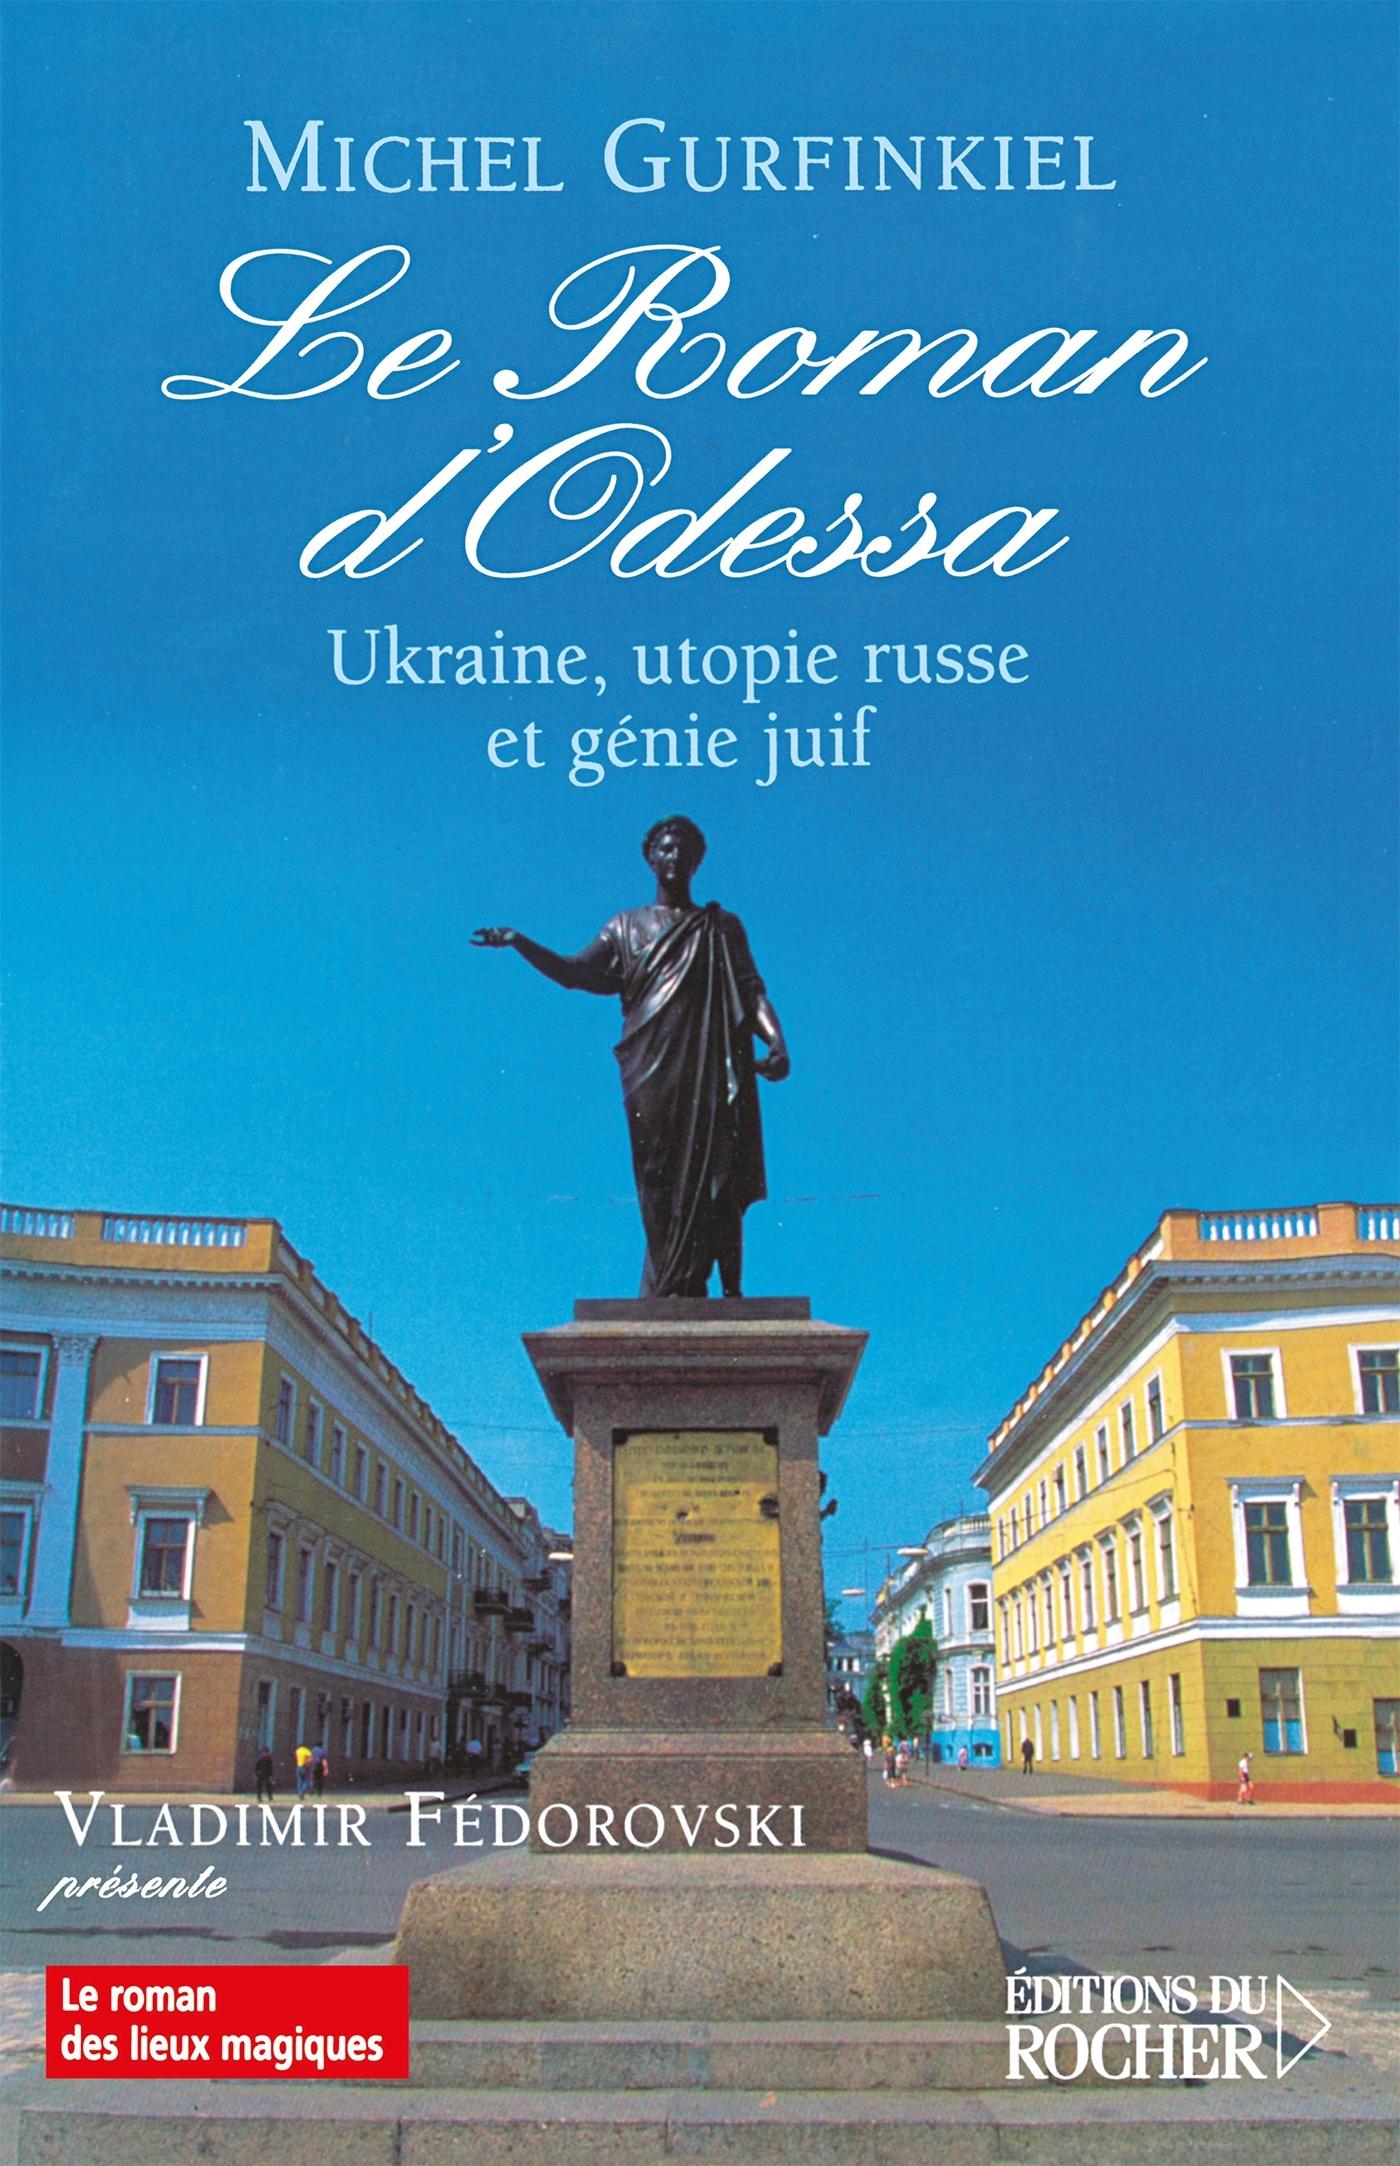 LE ROMAN D'ODESSA - UKRAINE, UTOPIE RUSSE ET GENIE JUIF